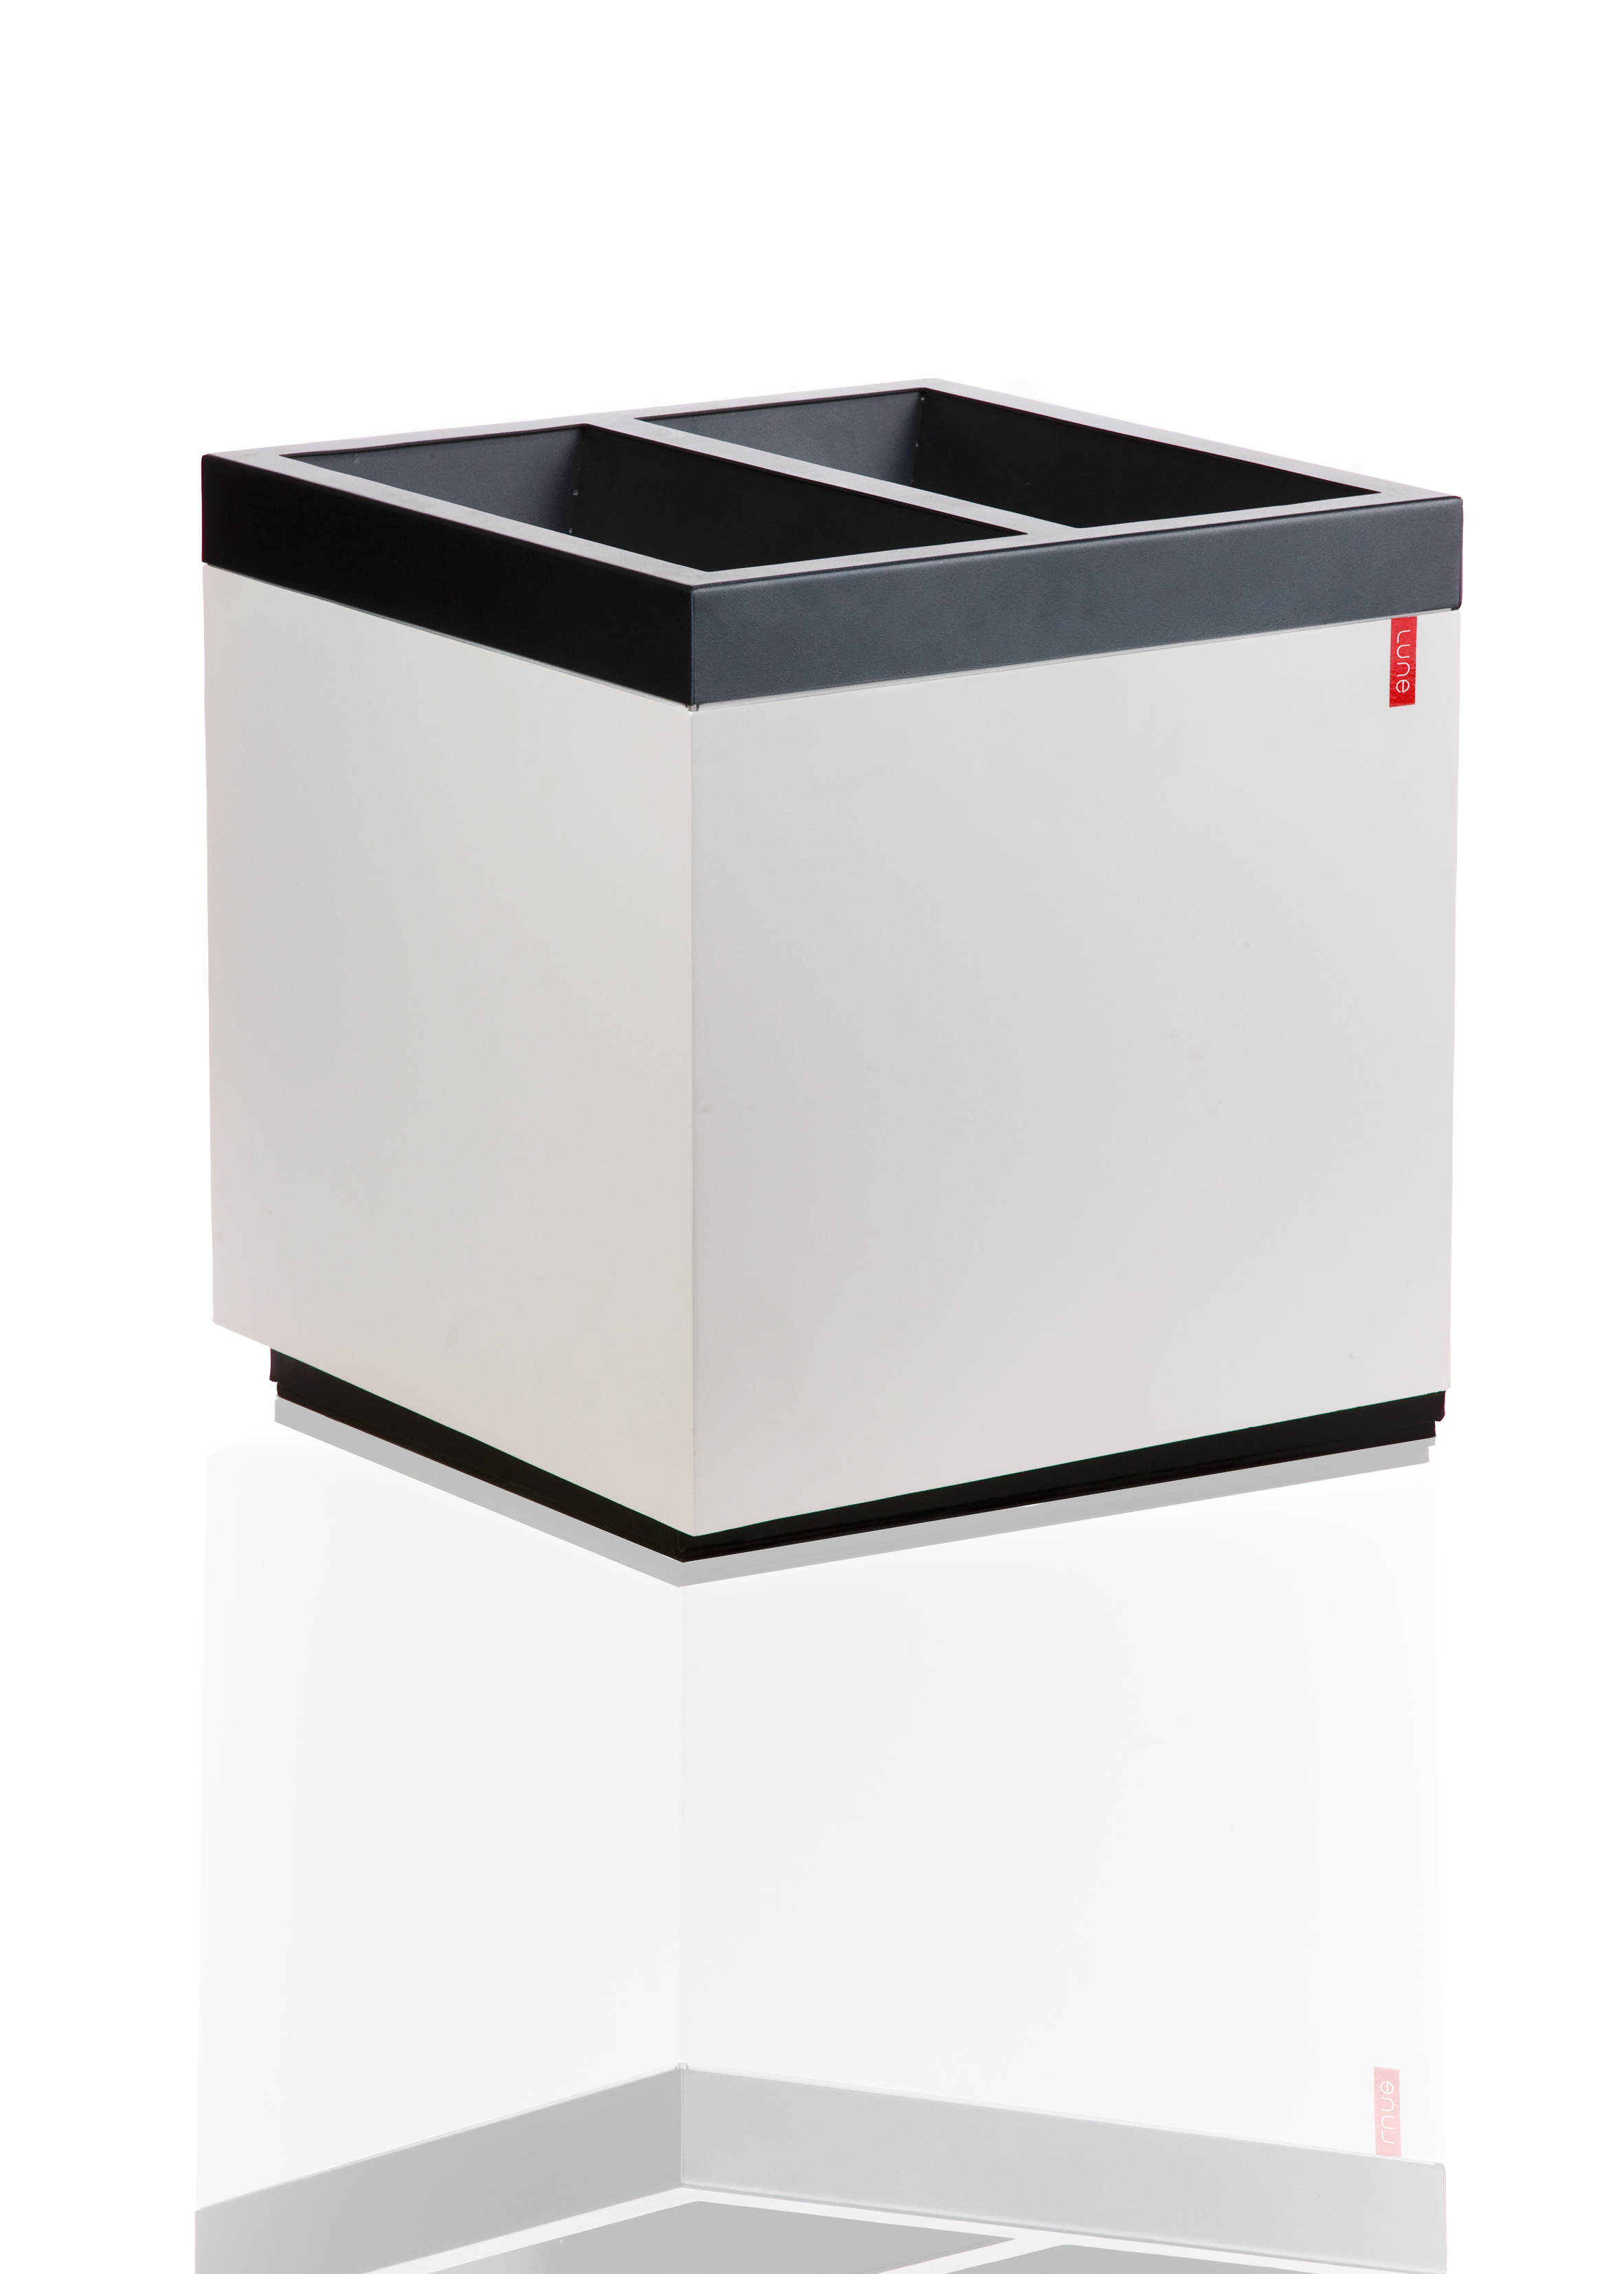 Duo afvalbak Cube met twee fracties